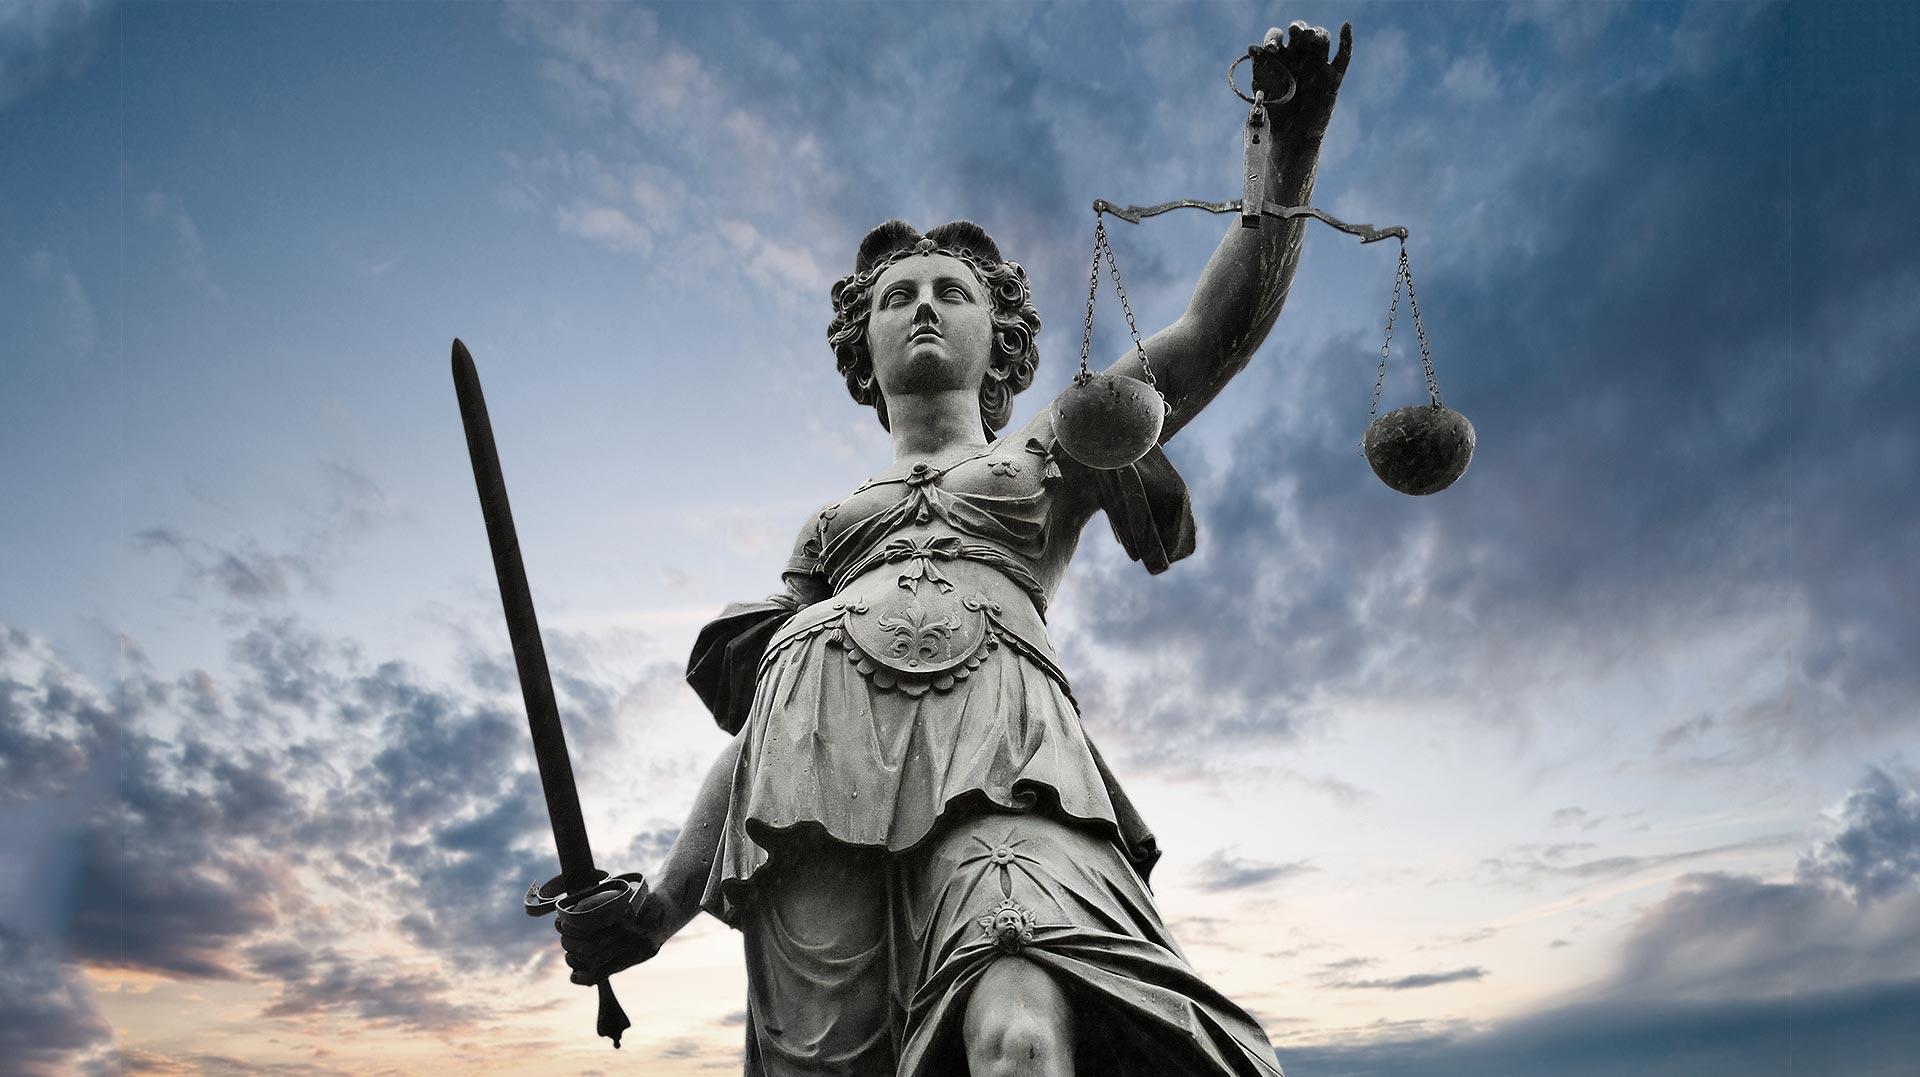 Miami Divorce Attorney & <br> Florida Family Law Firm